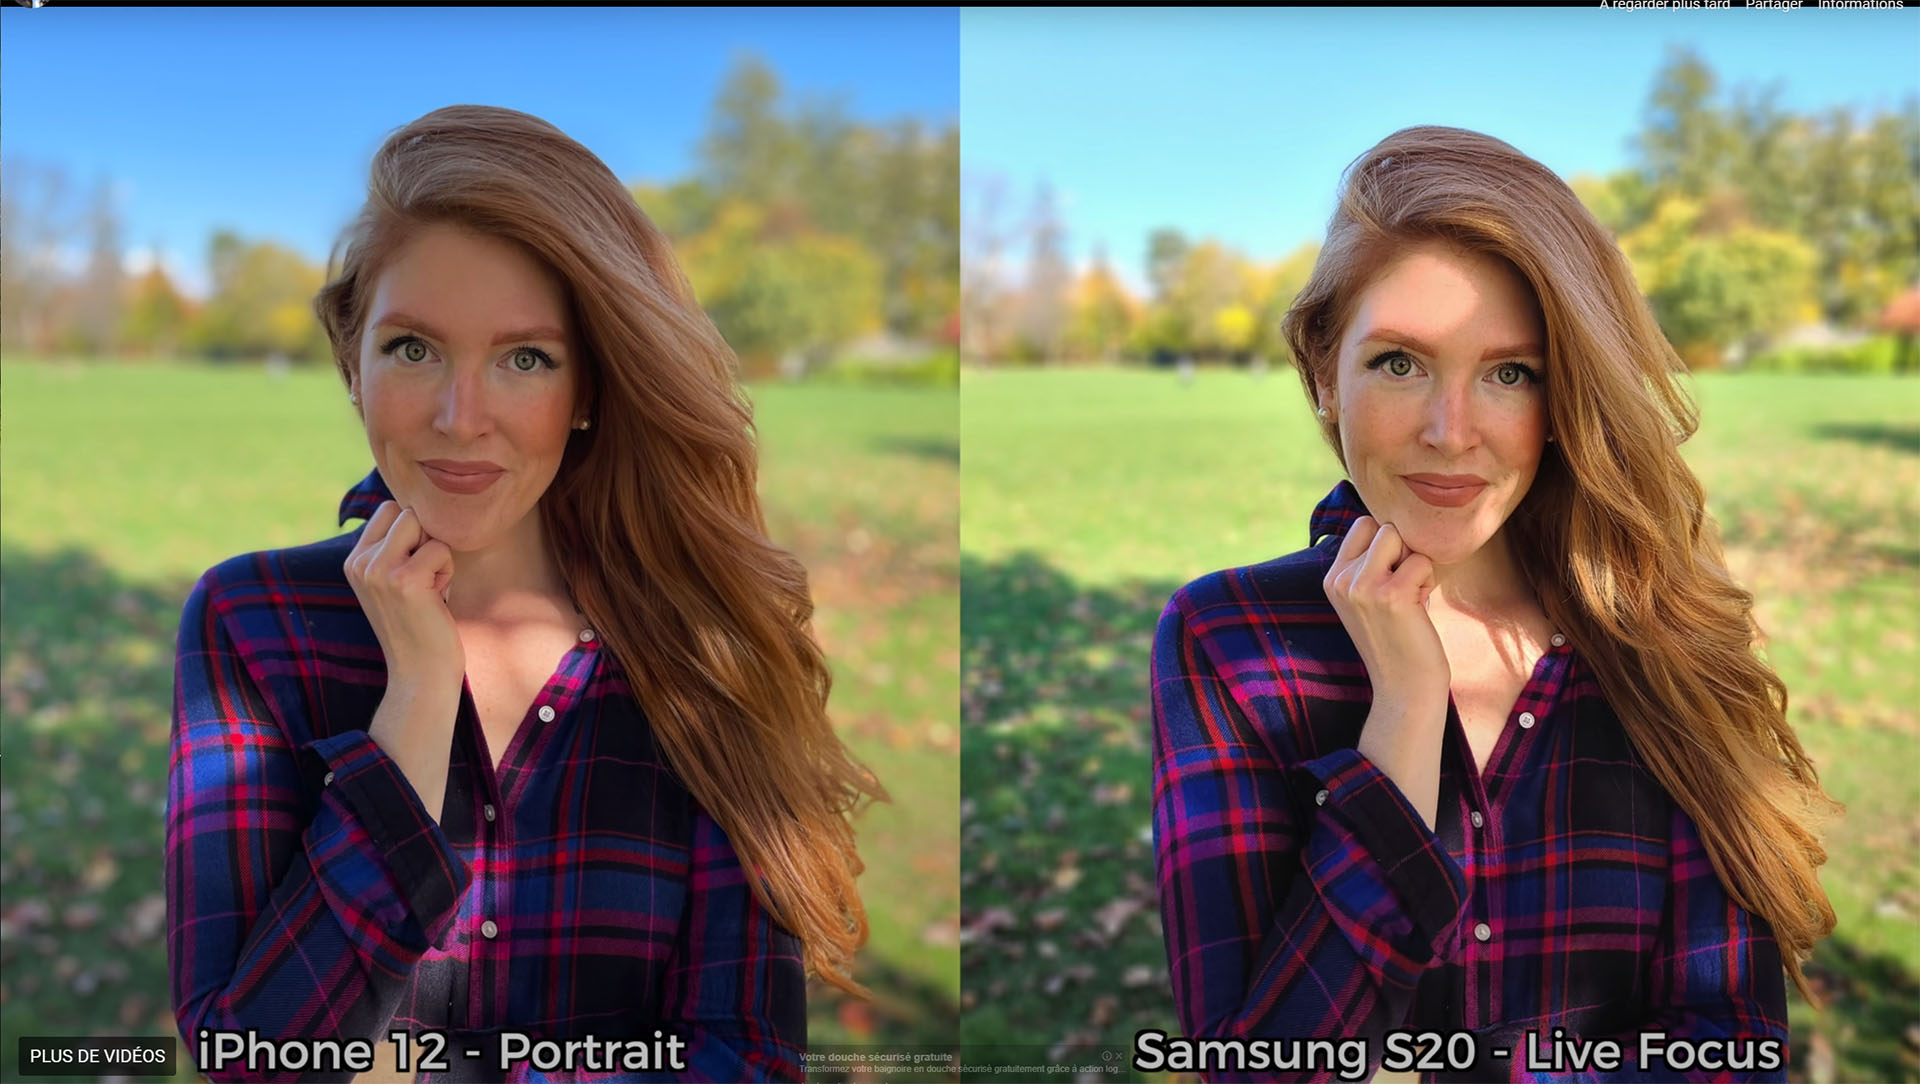 S20 vs Iphone12.jpg